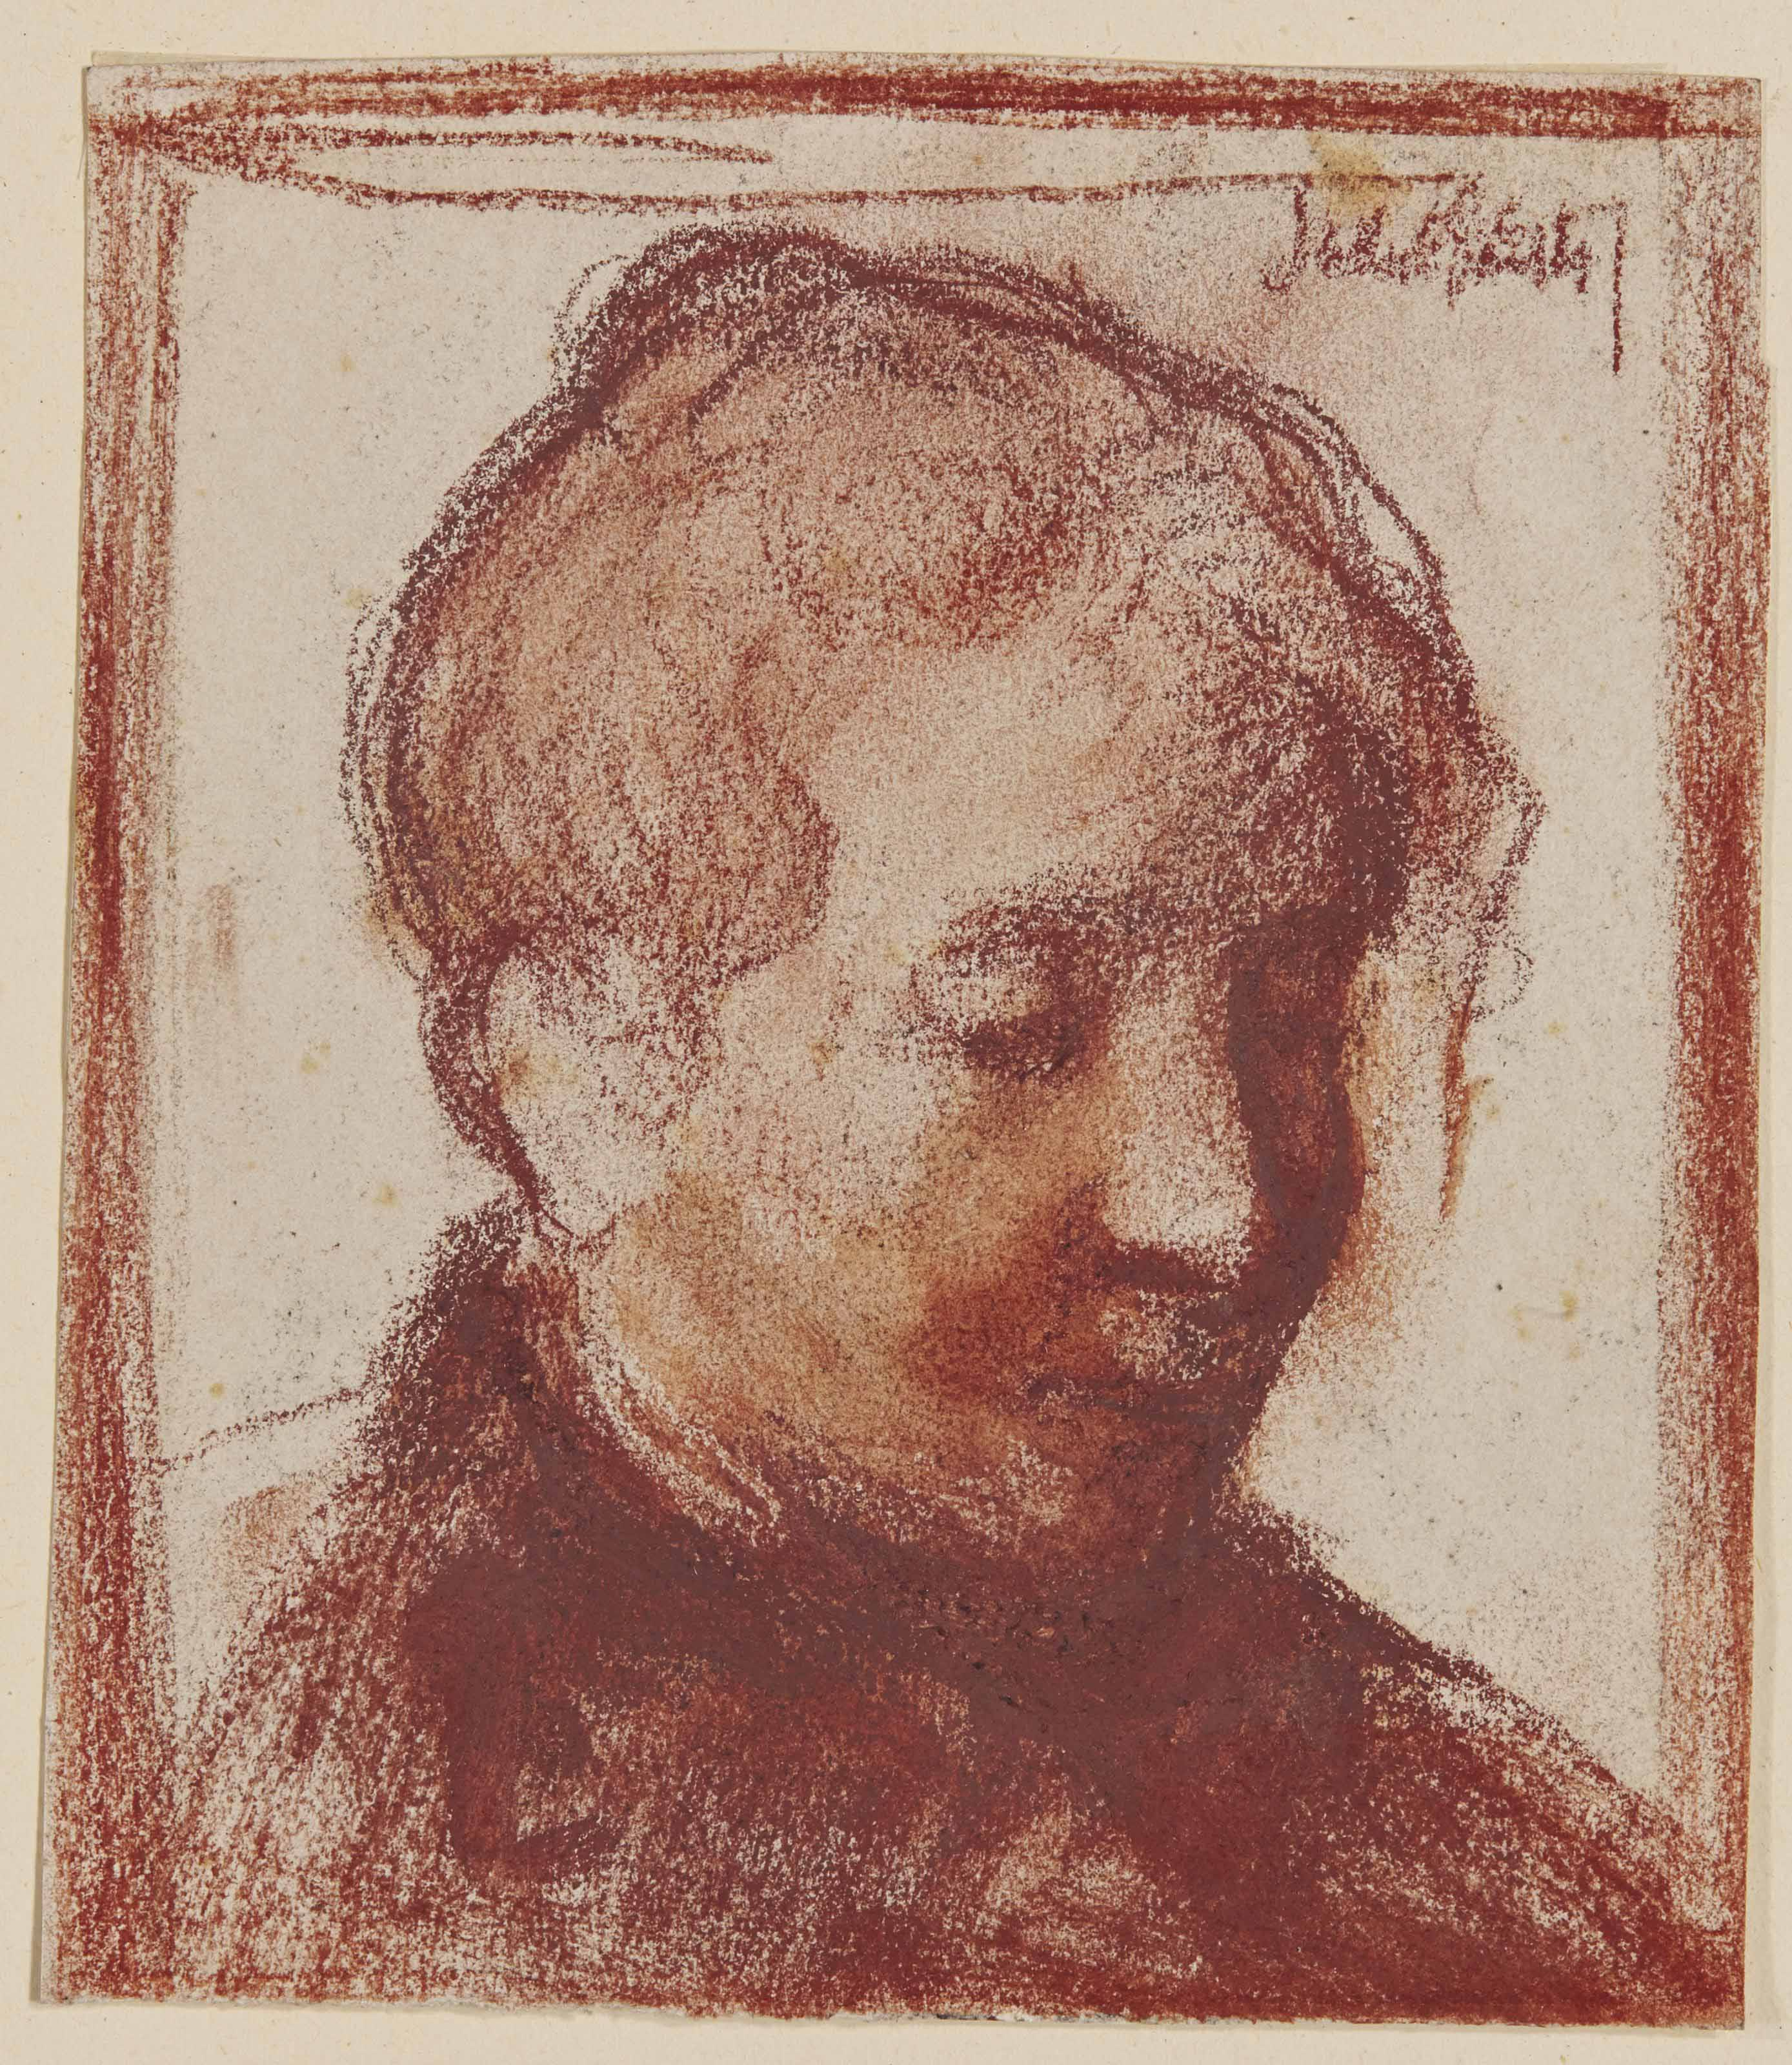 JAKOB SMITS (1855-1928)